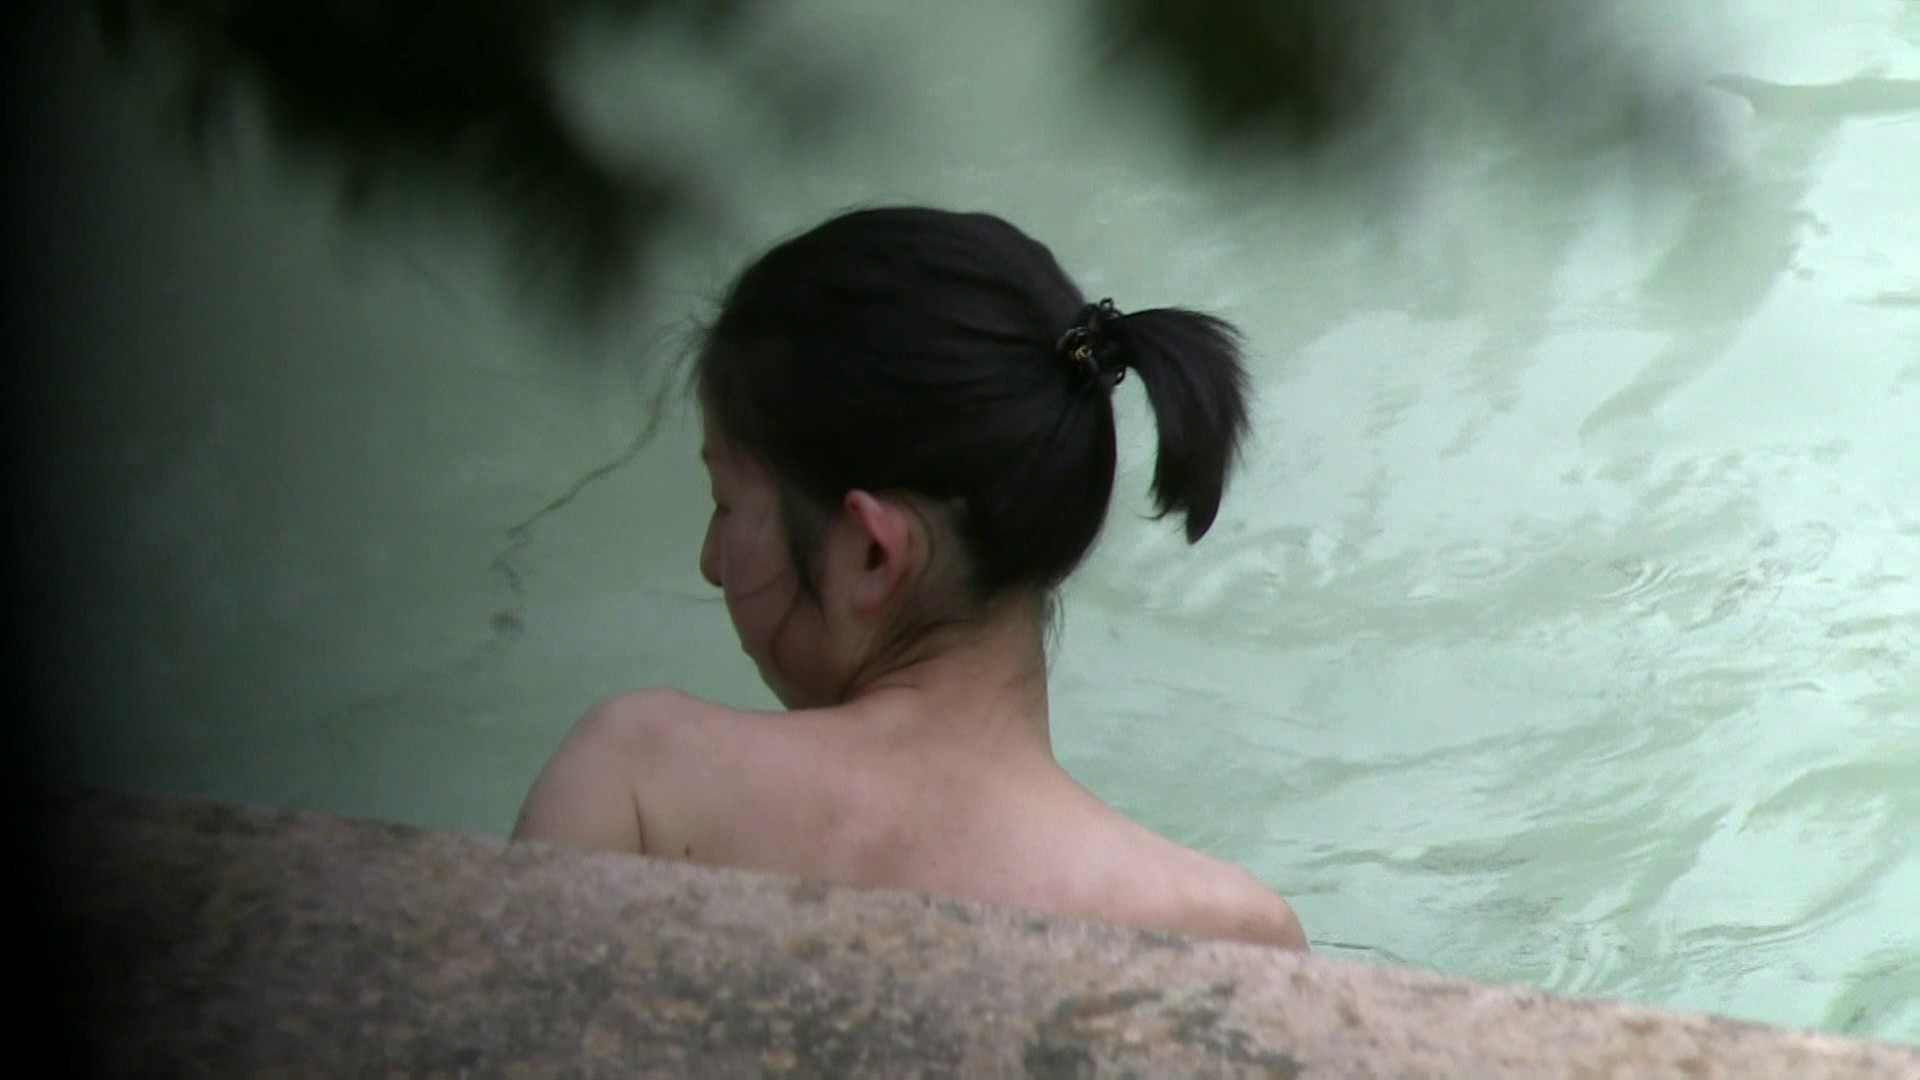 Aquaな露天風呂Vol.656 OLセックス  72画像 9